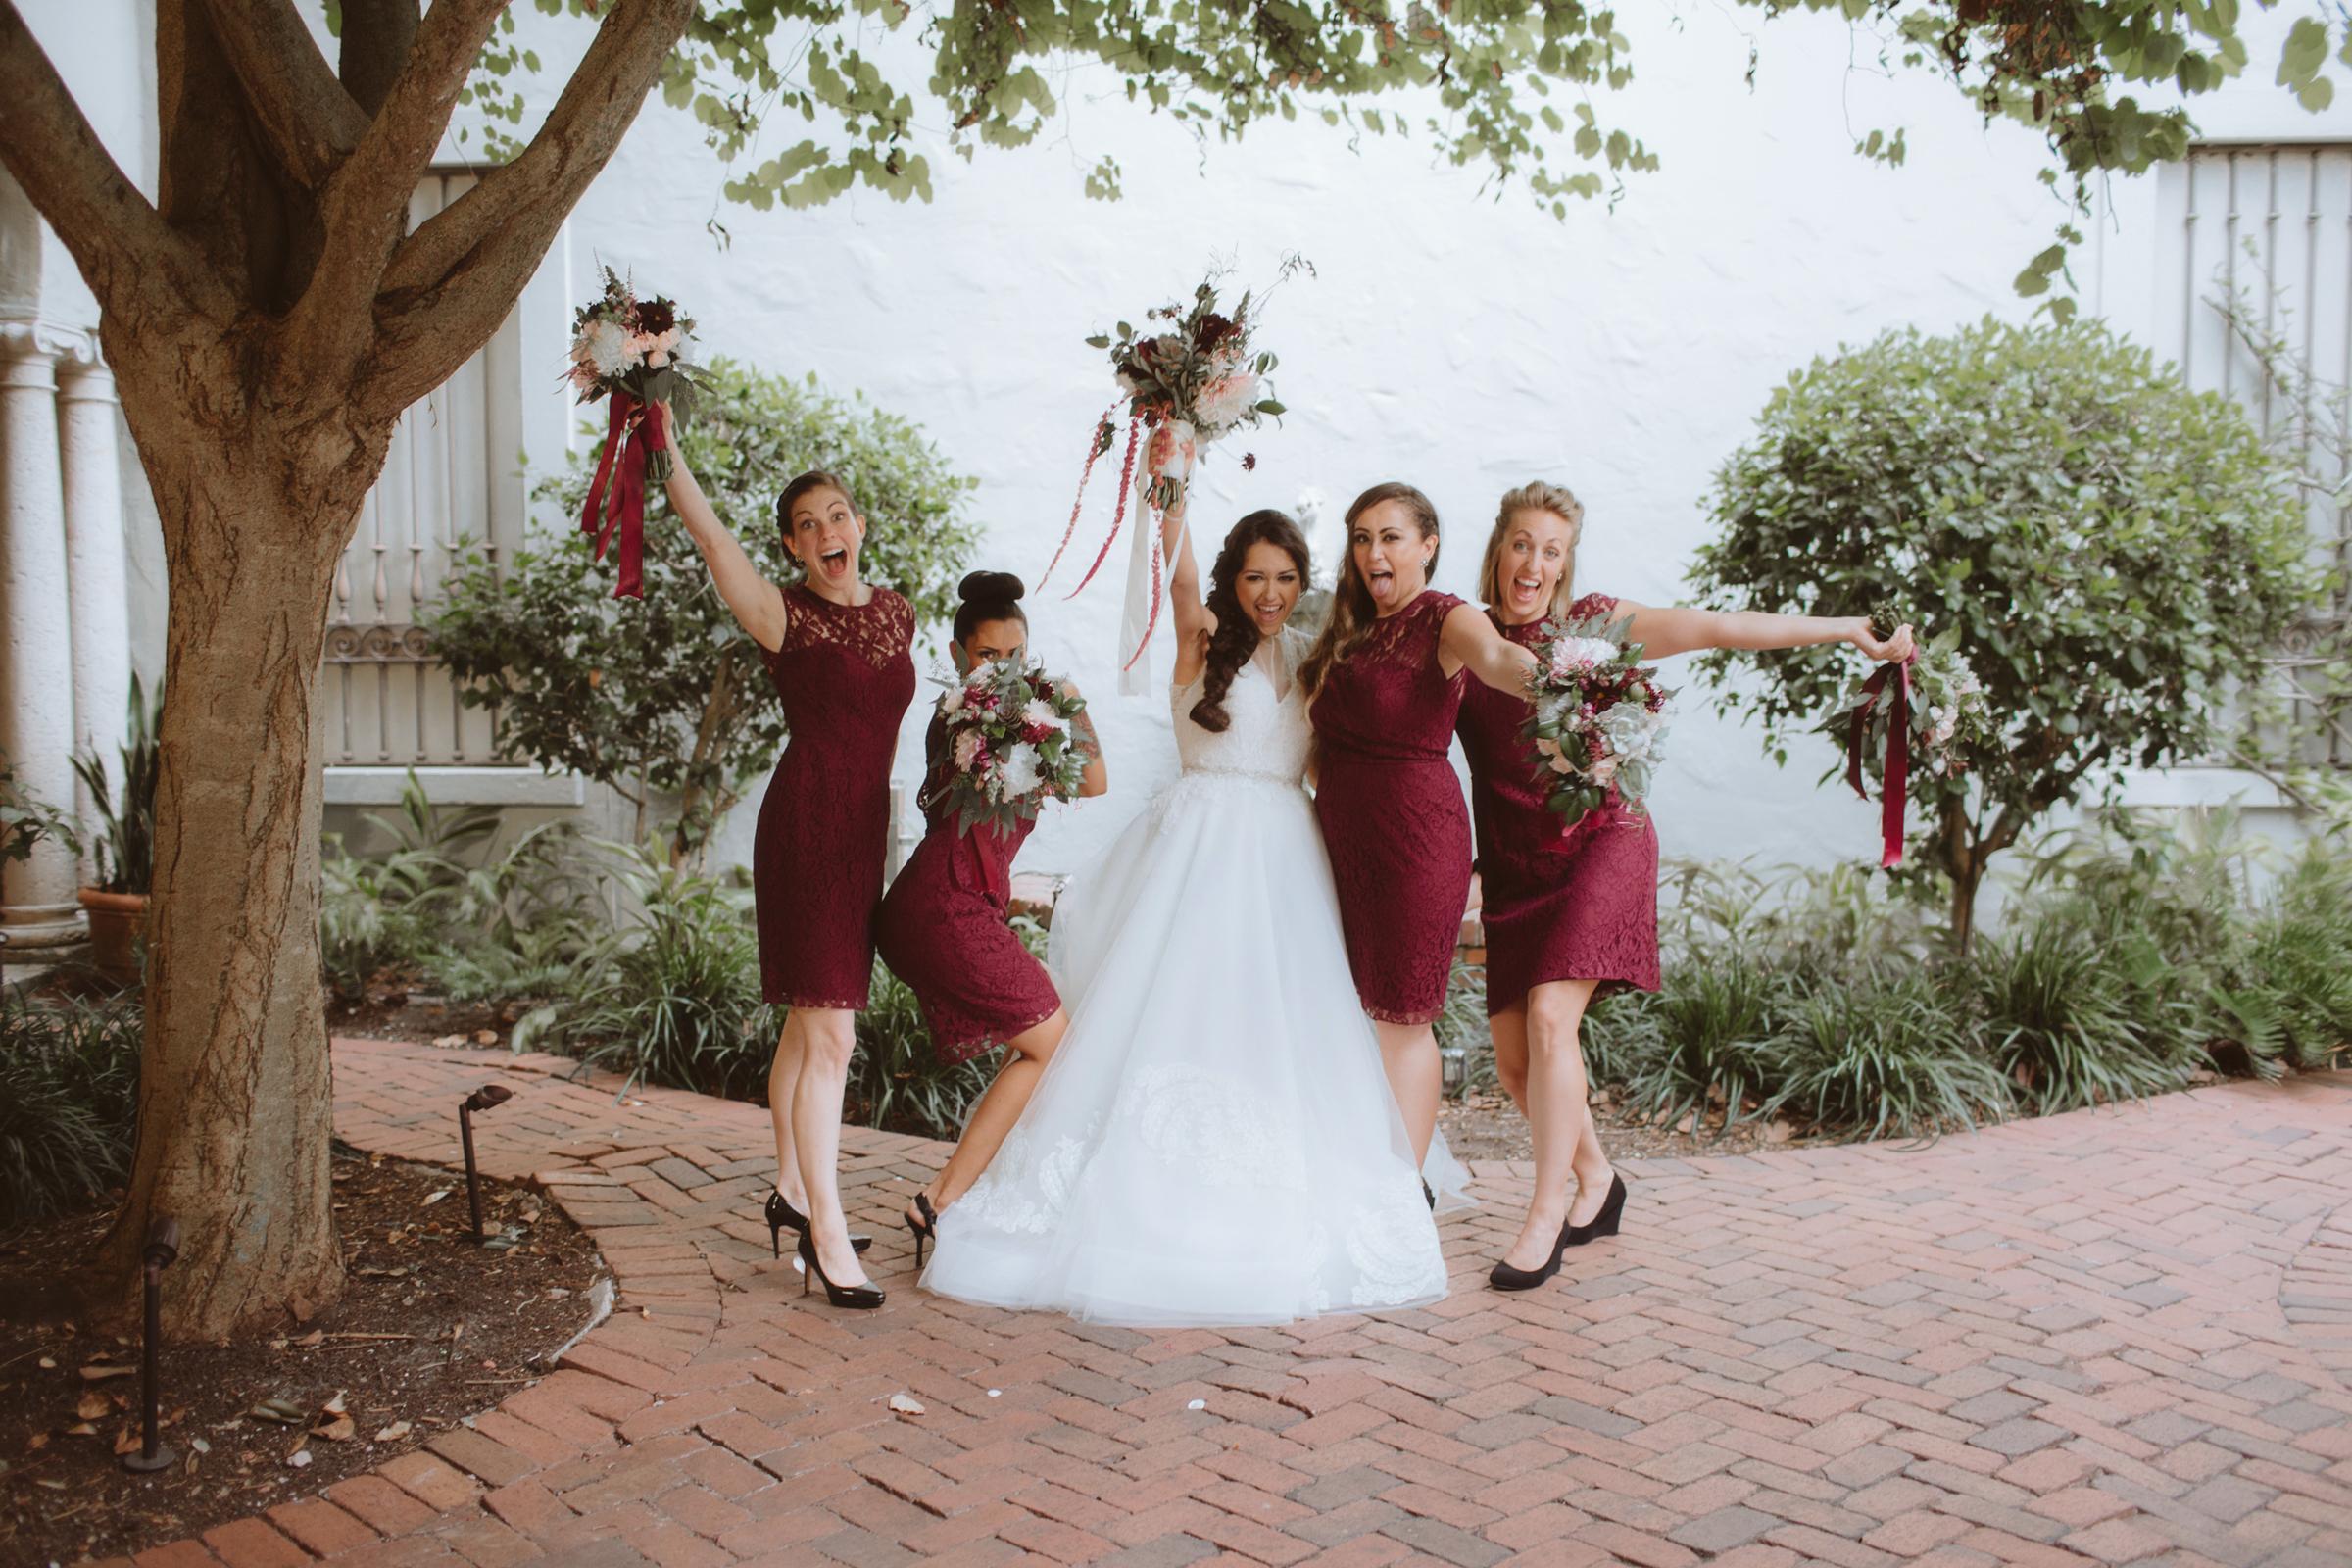 wedding day | MFA St Pete | Vanessa Boy Photography | vanessaboy.com-467.com |final.jpg